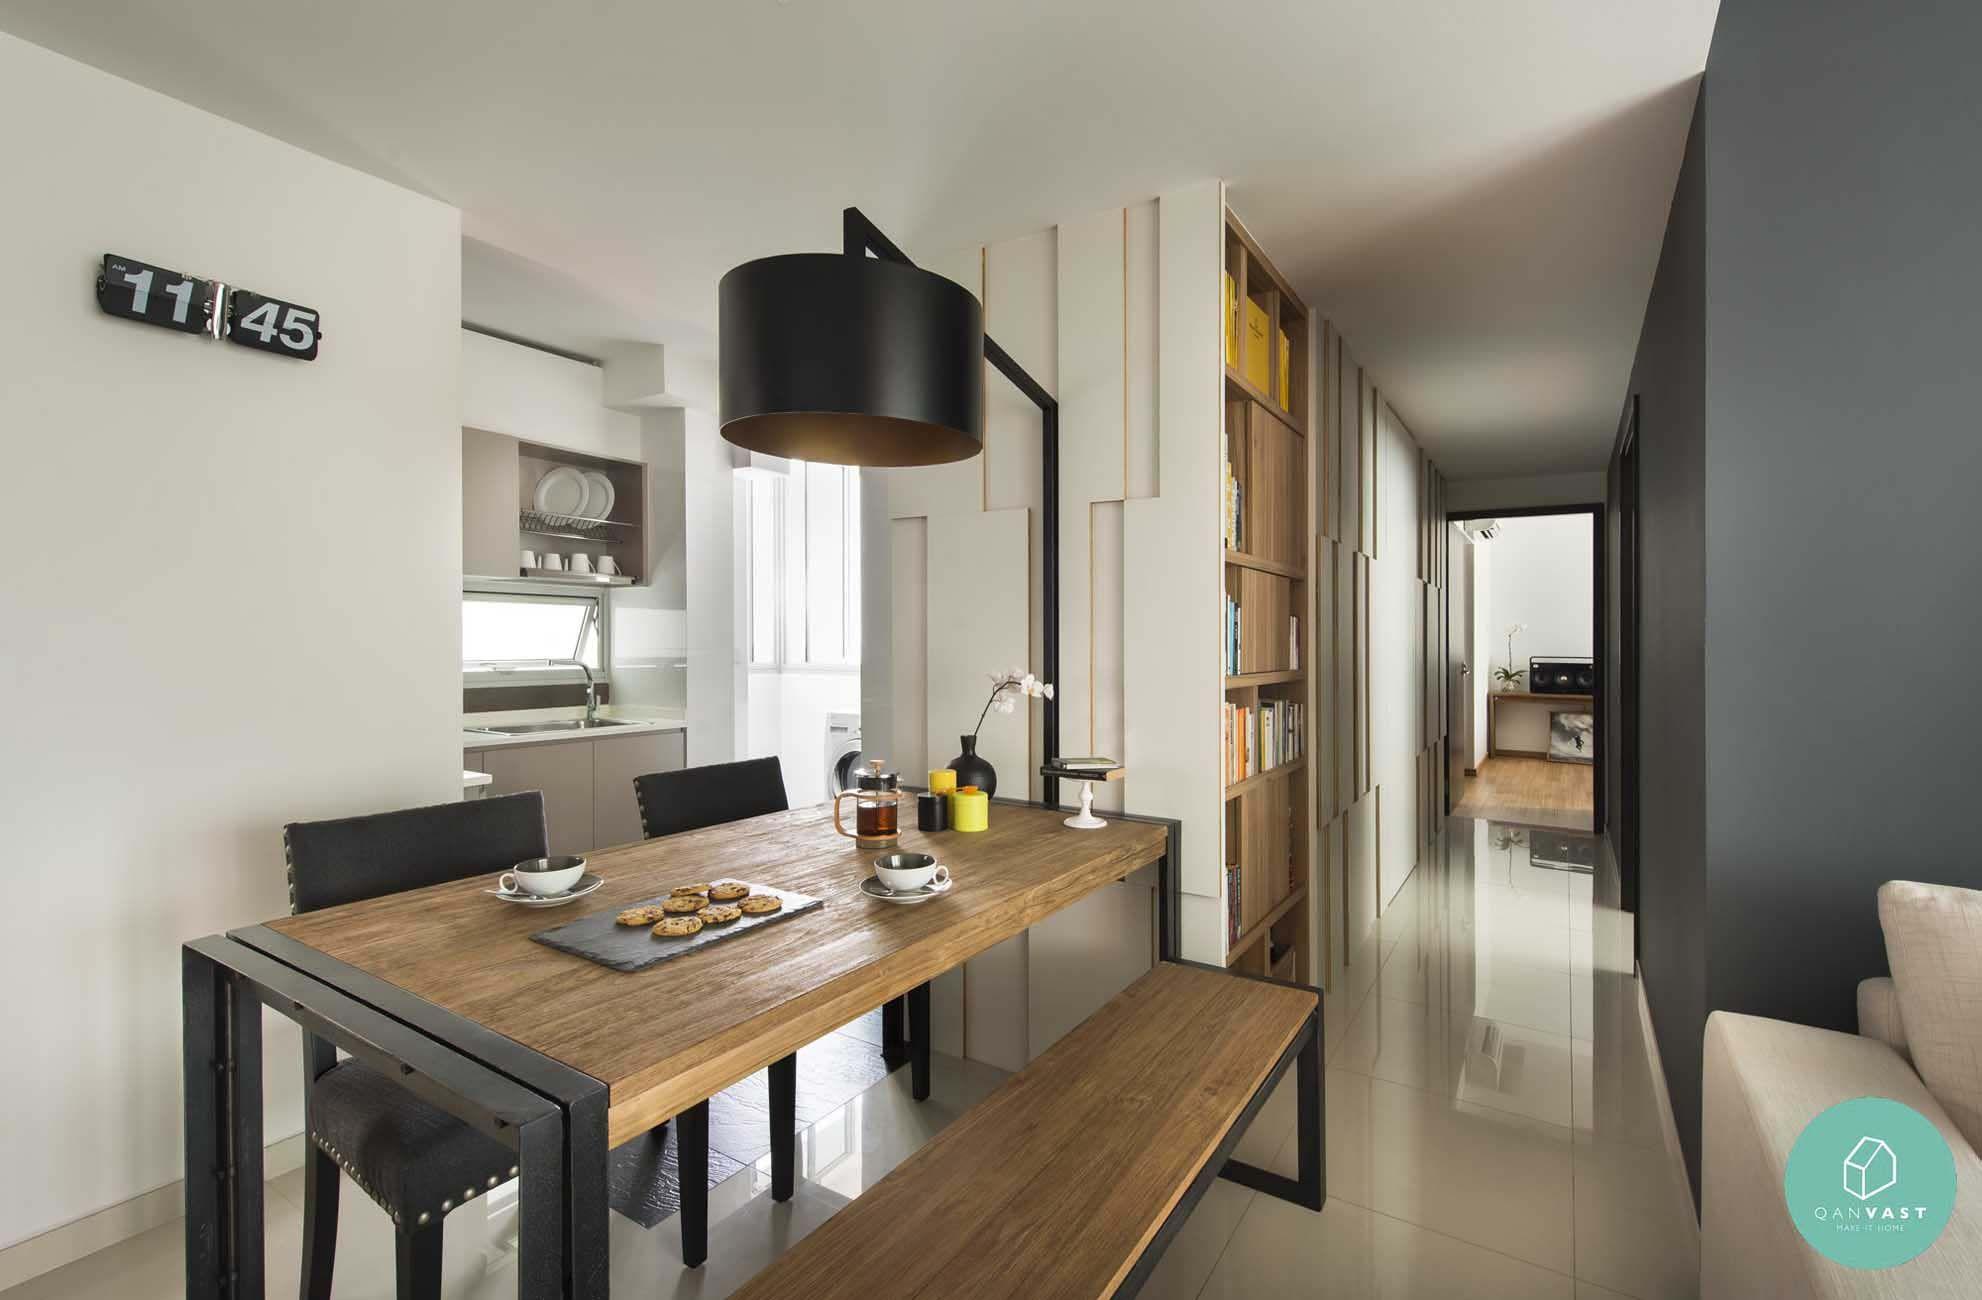 10 Beautiful Home Renovations Under 50 000 Lofts